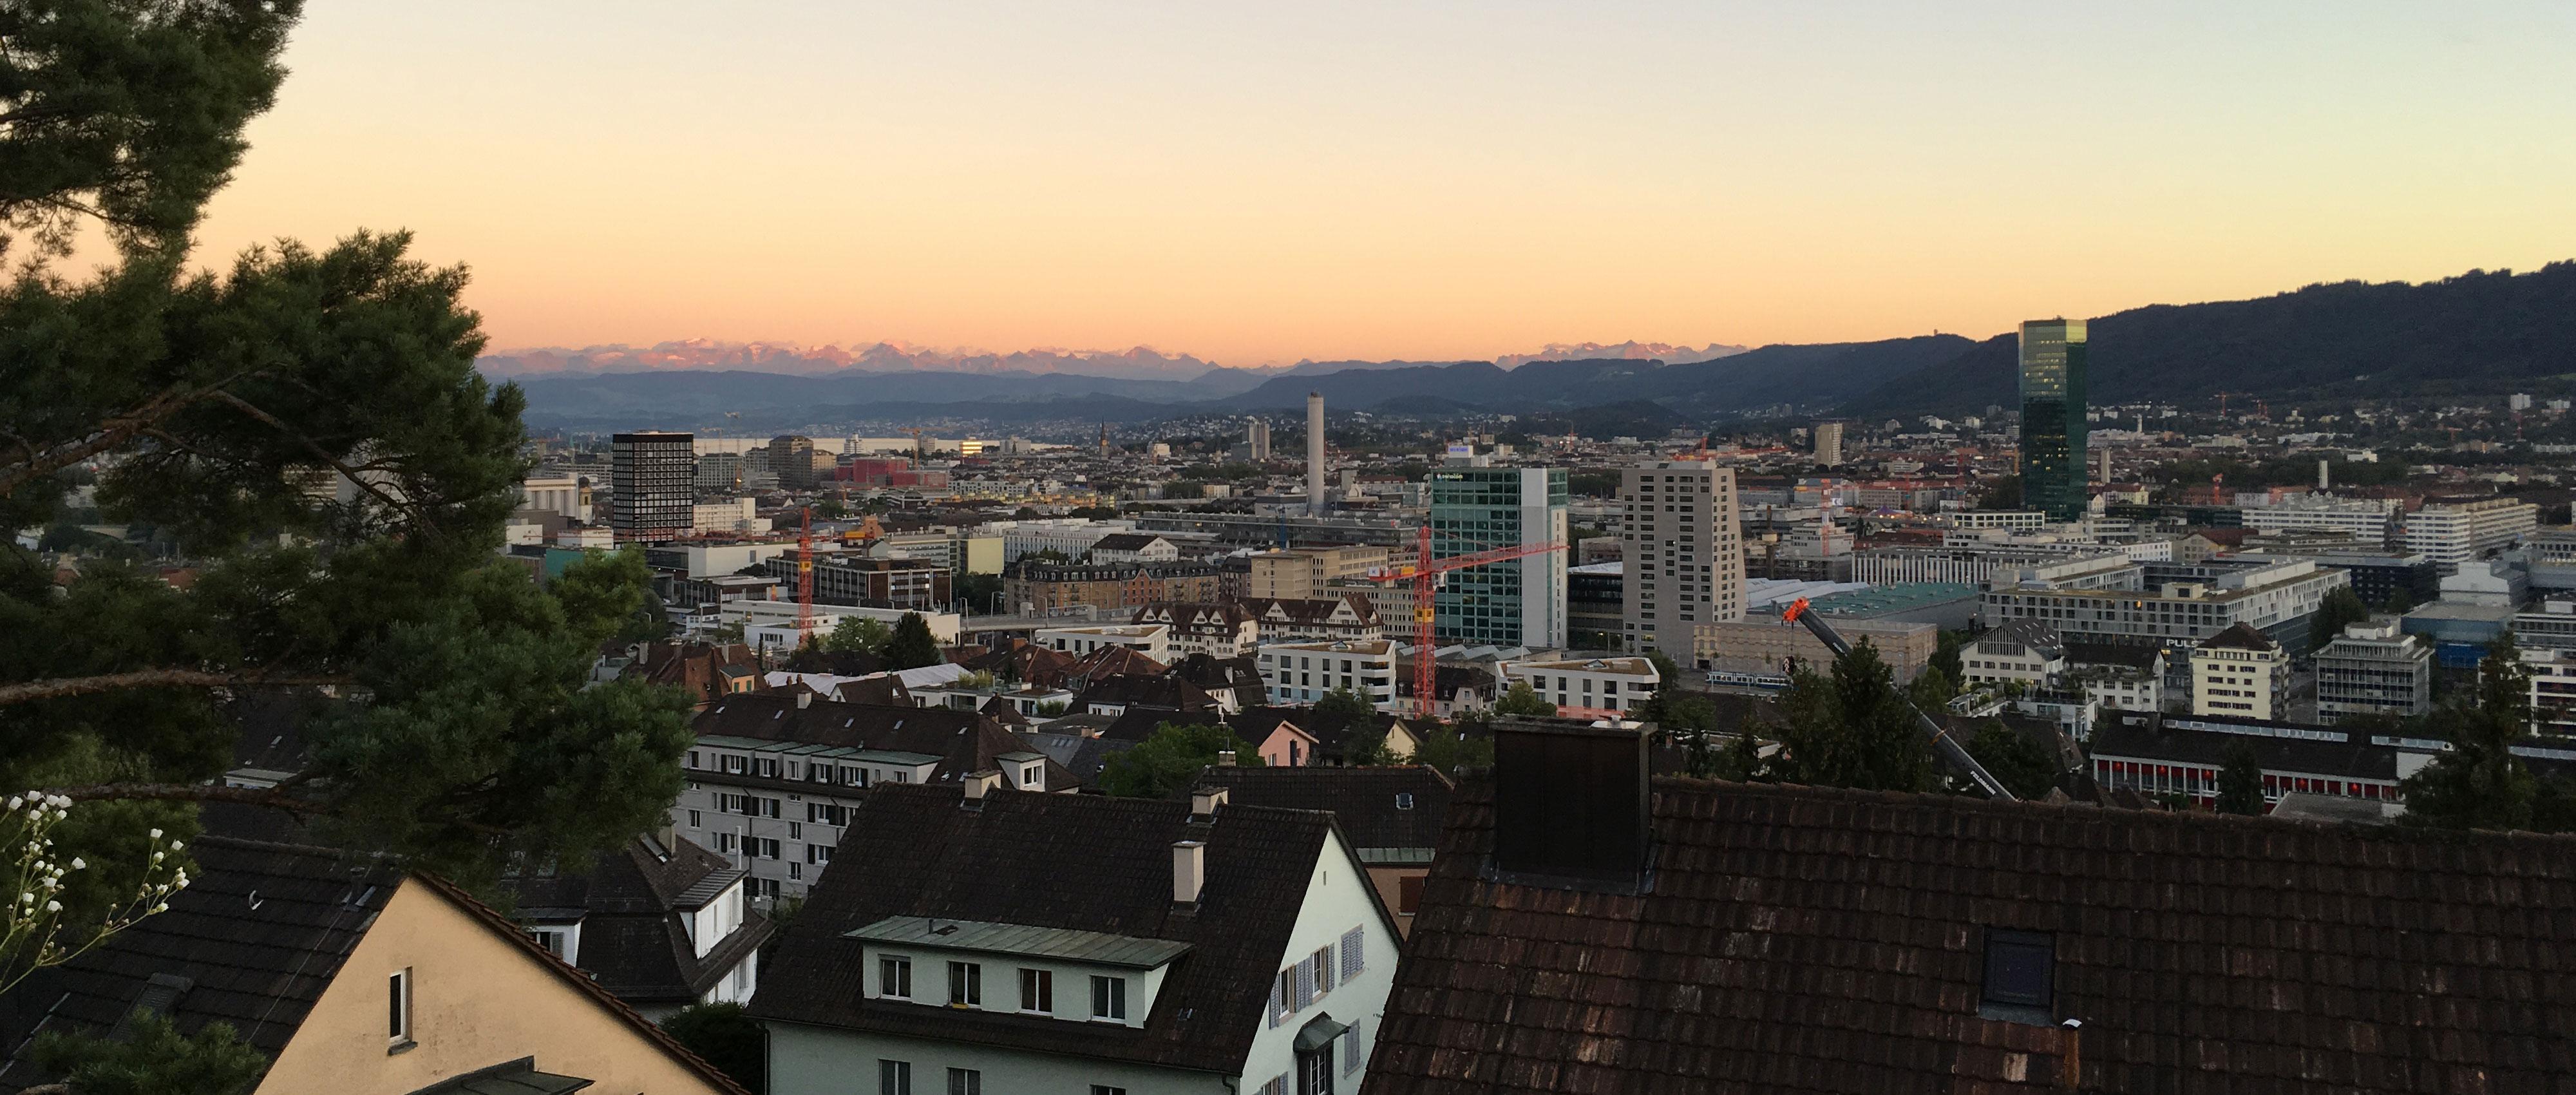 Zürich skyline mountains